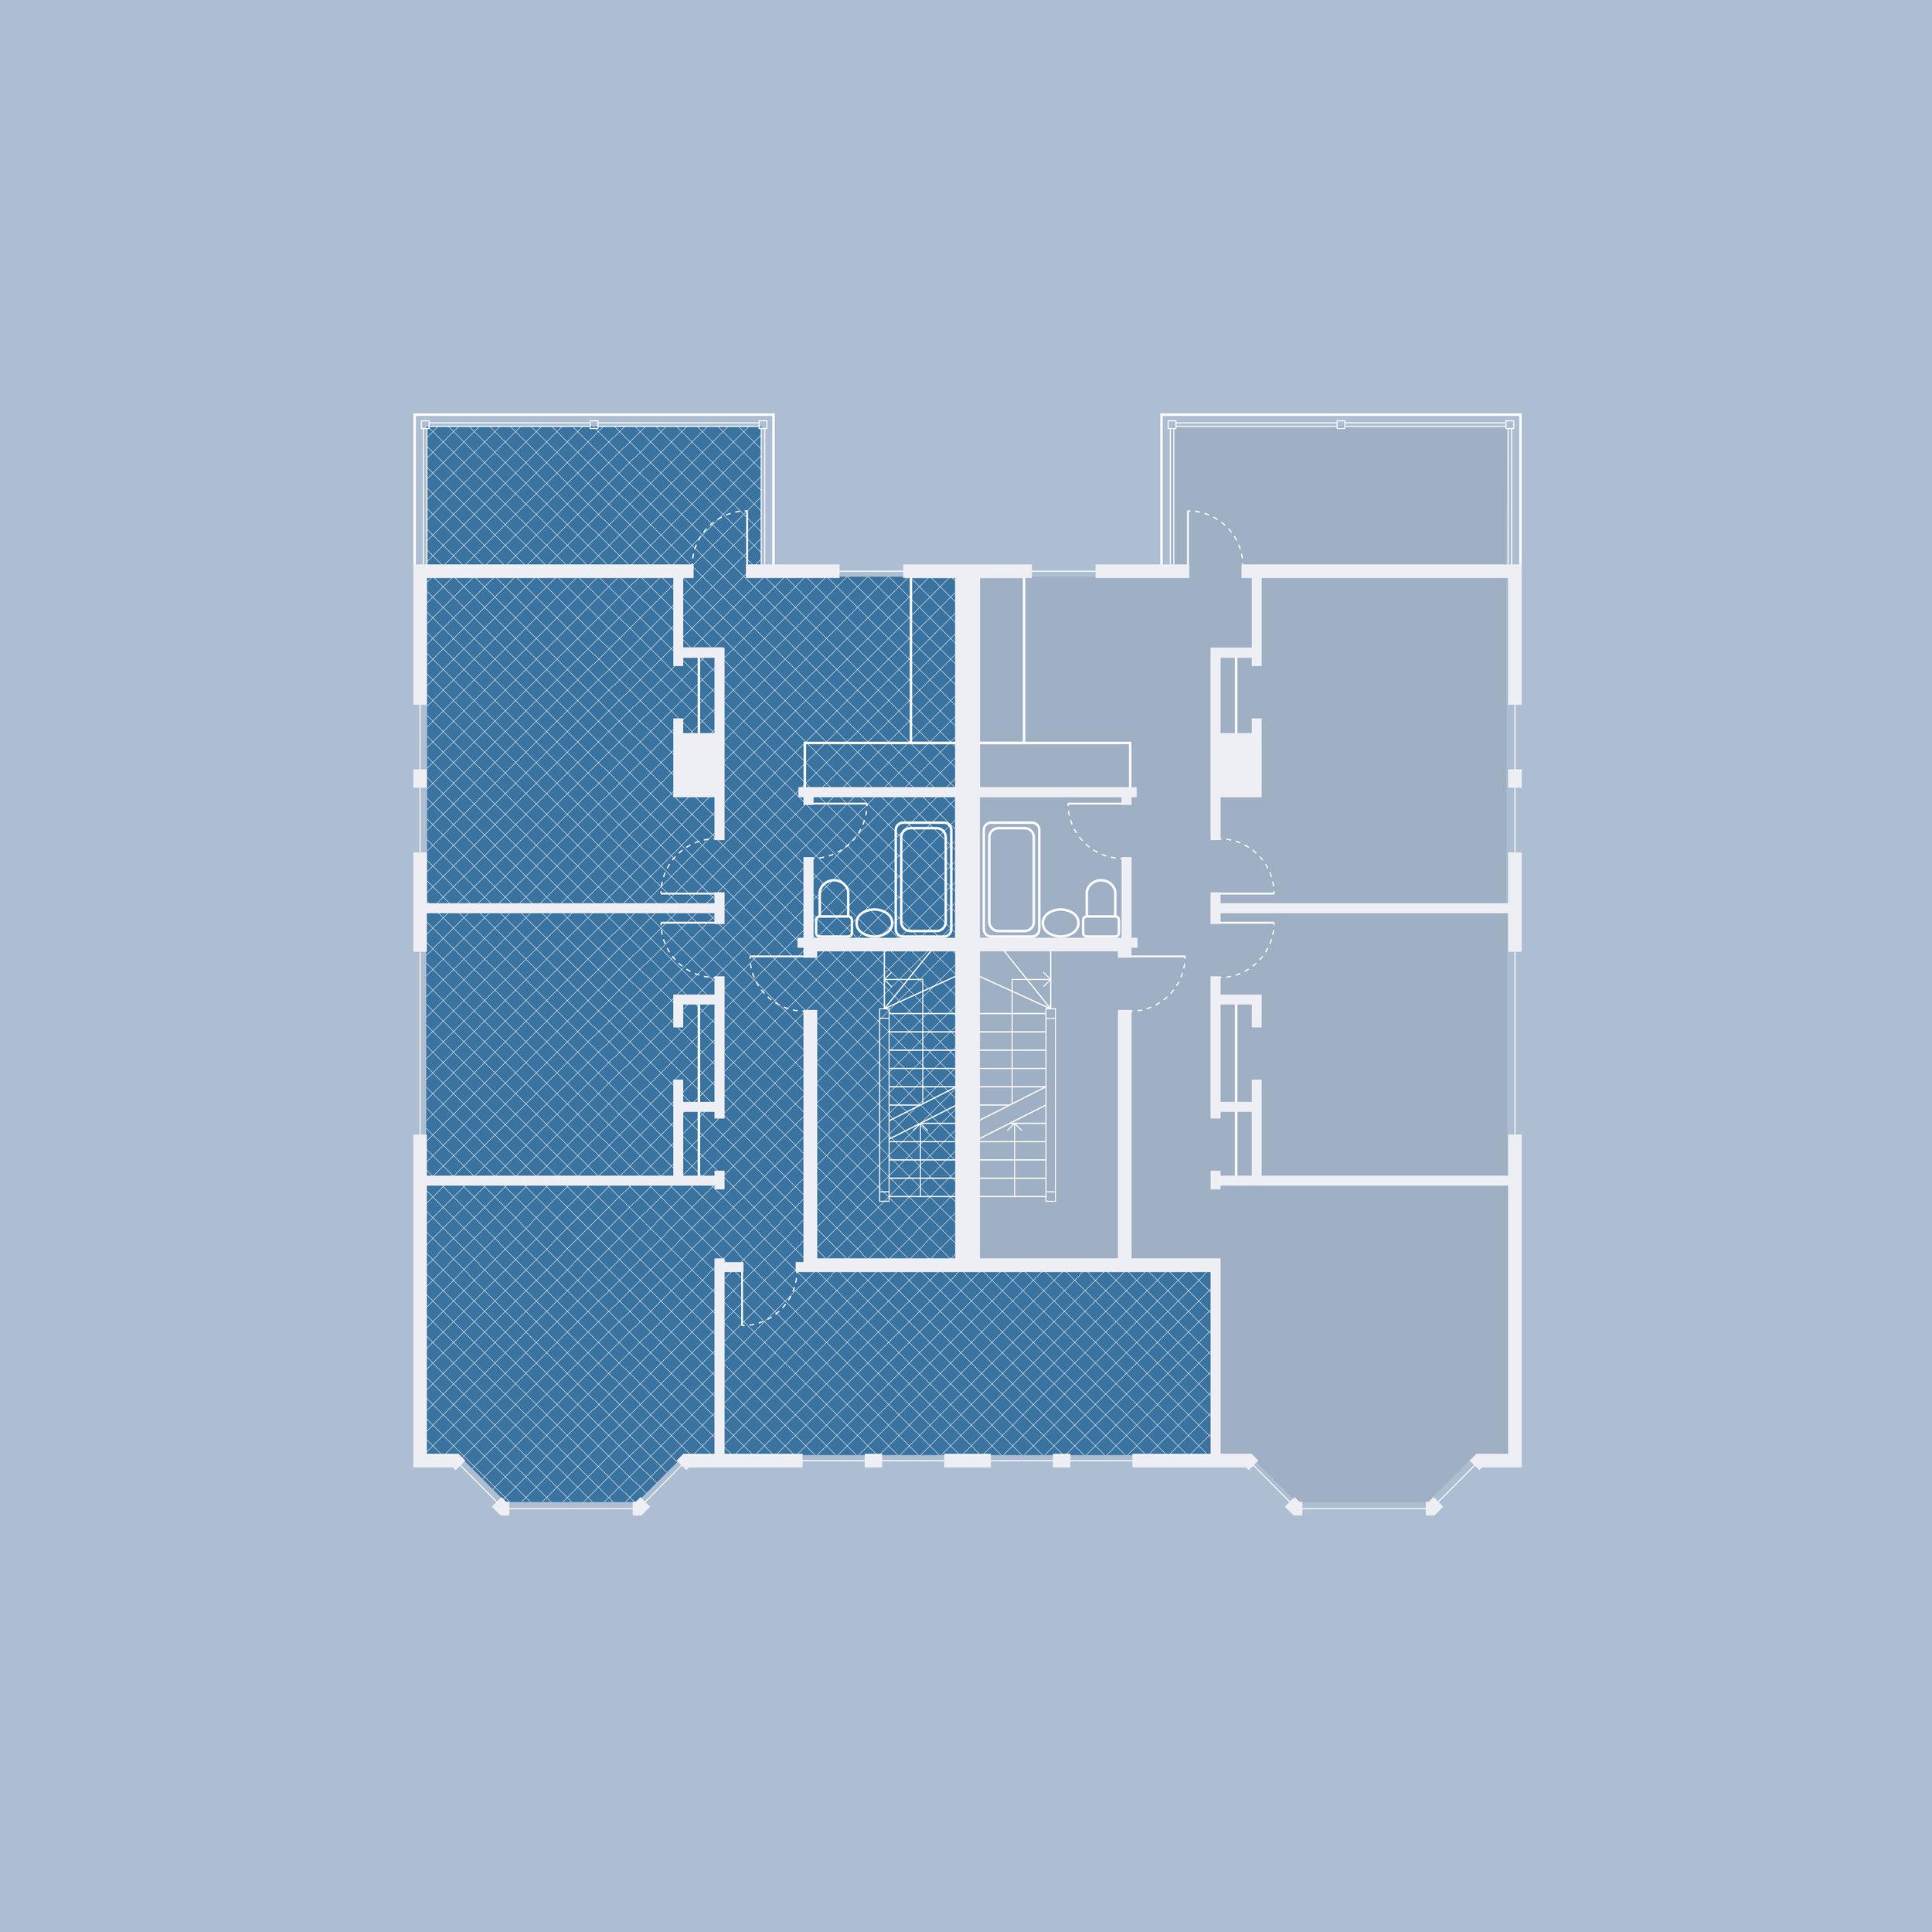 TripleDecker_Wormhole_Plans-1.jpg